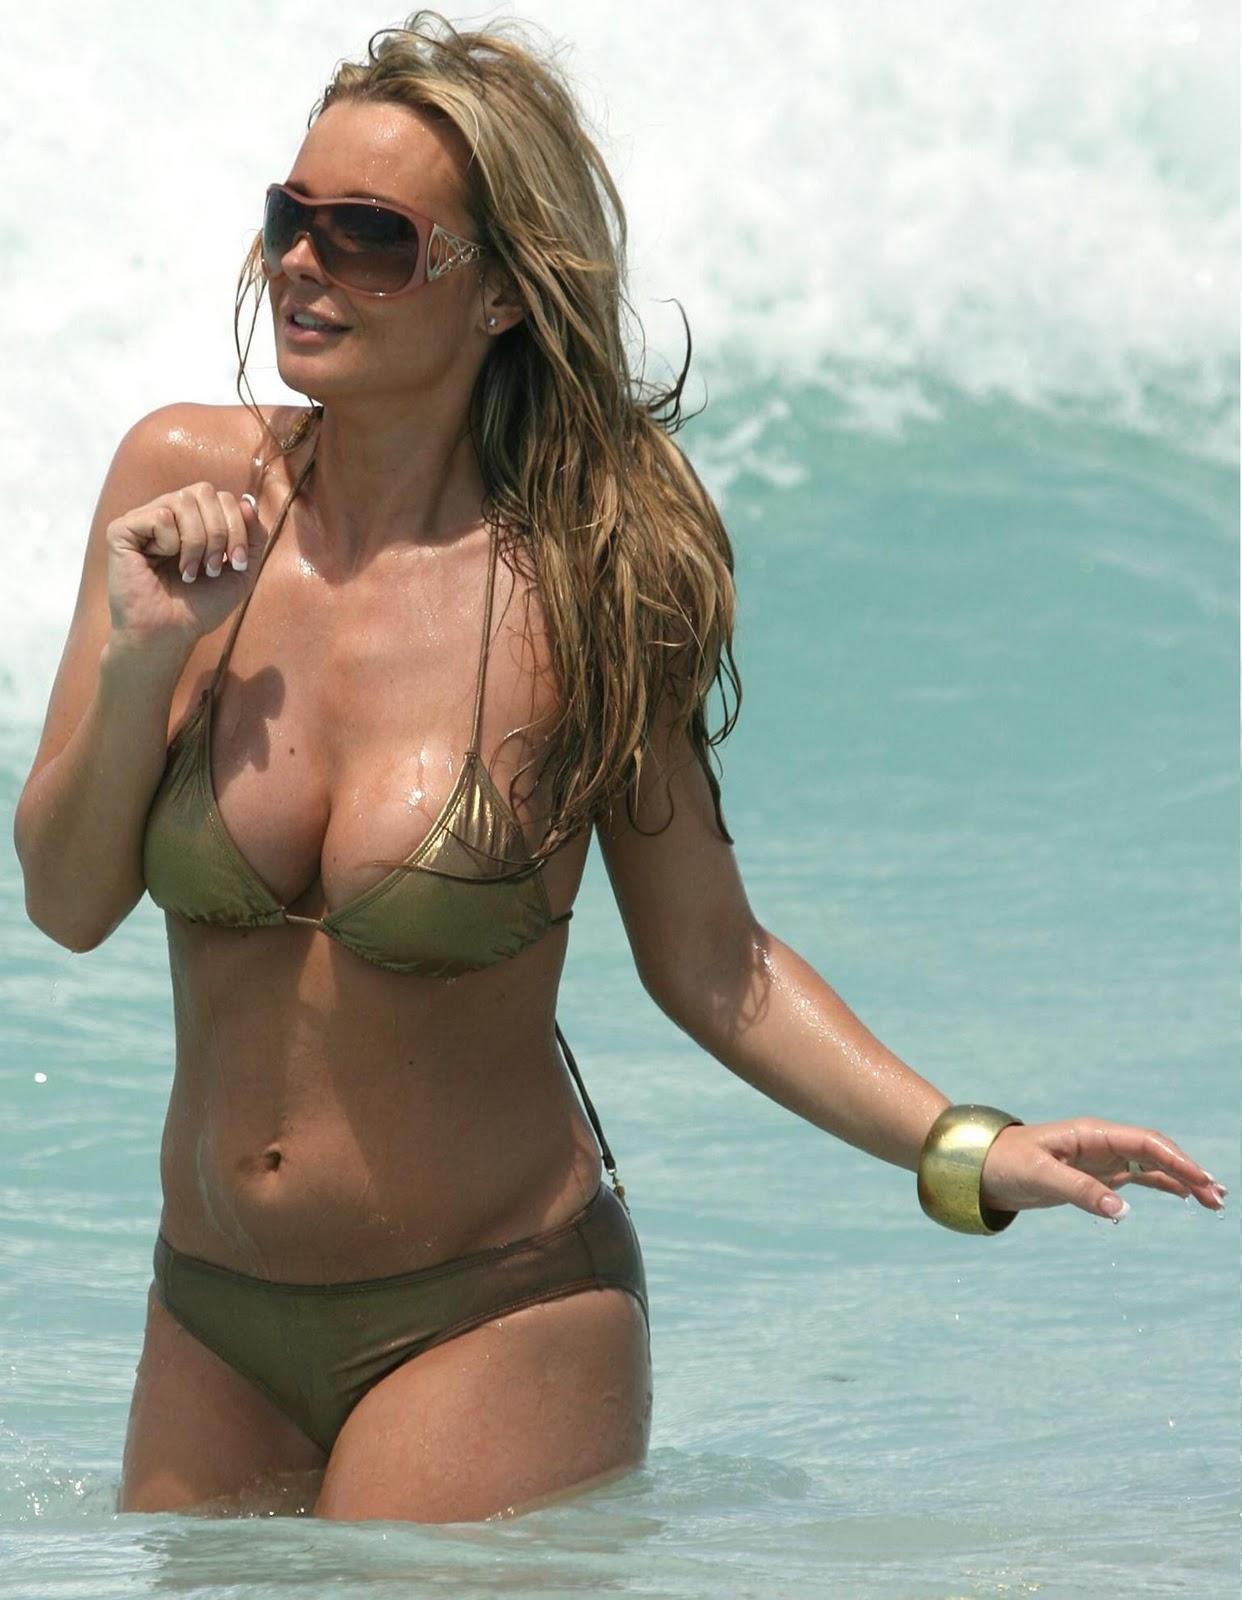 Amanda harrington nude pics